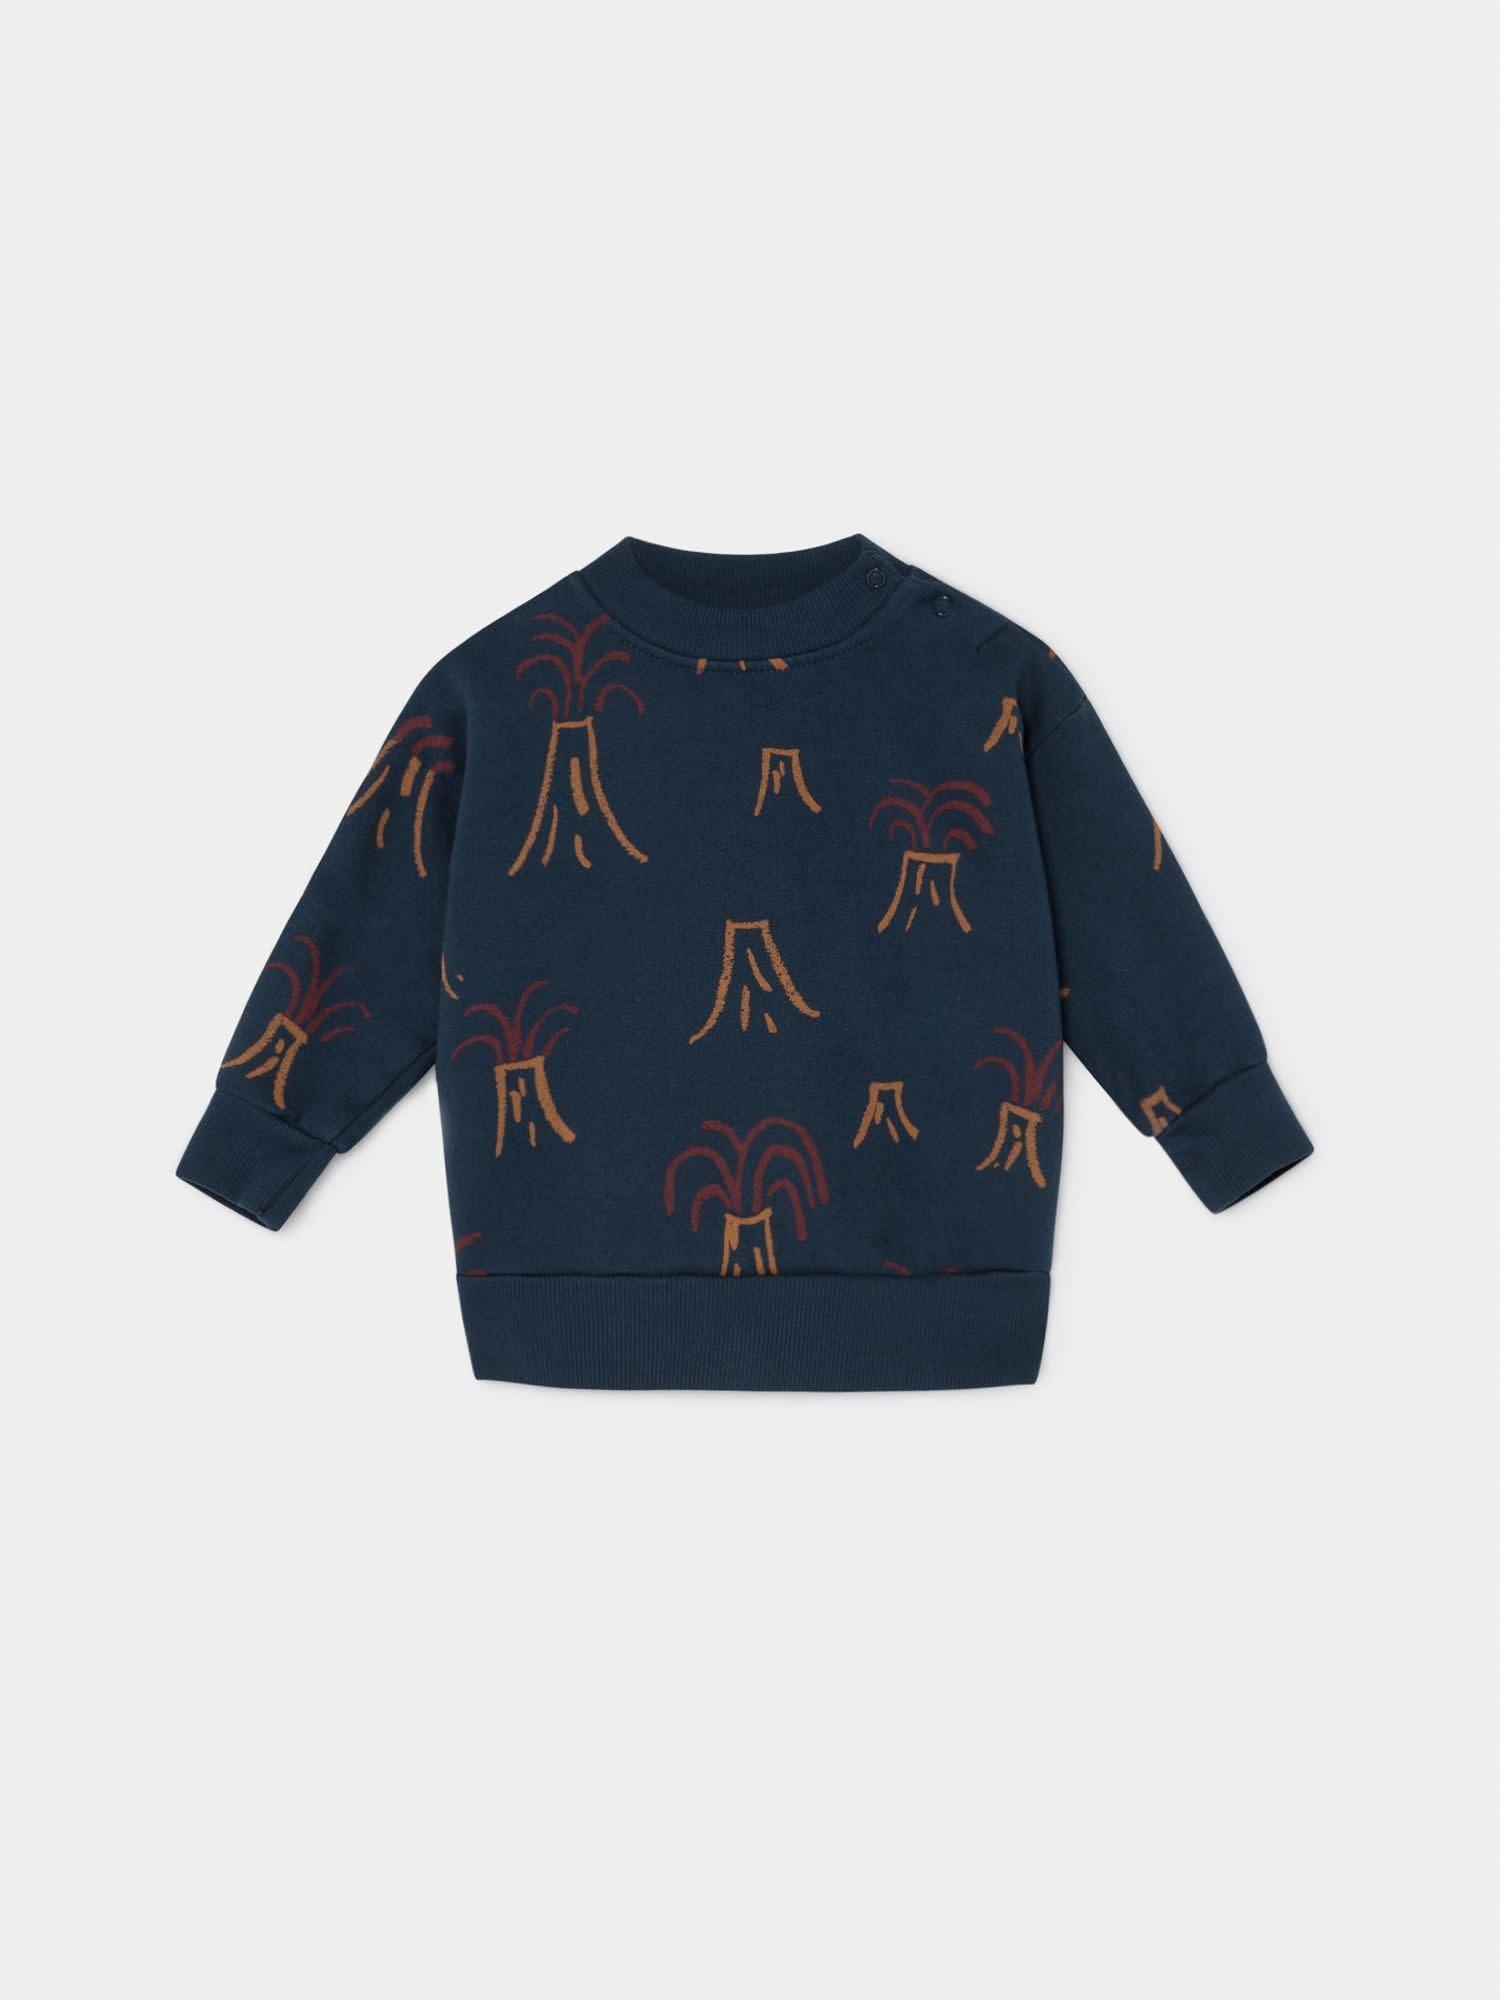 BOBO CHOSES All Over Volcano Sweatshirt